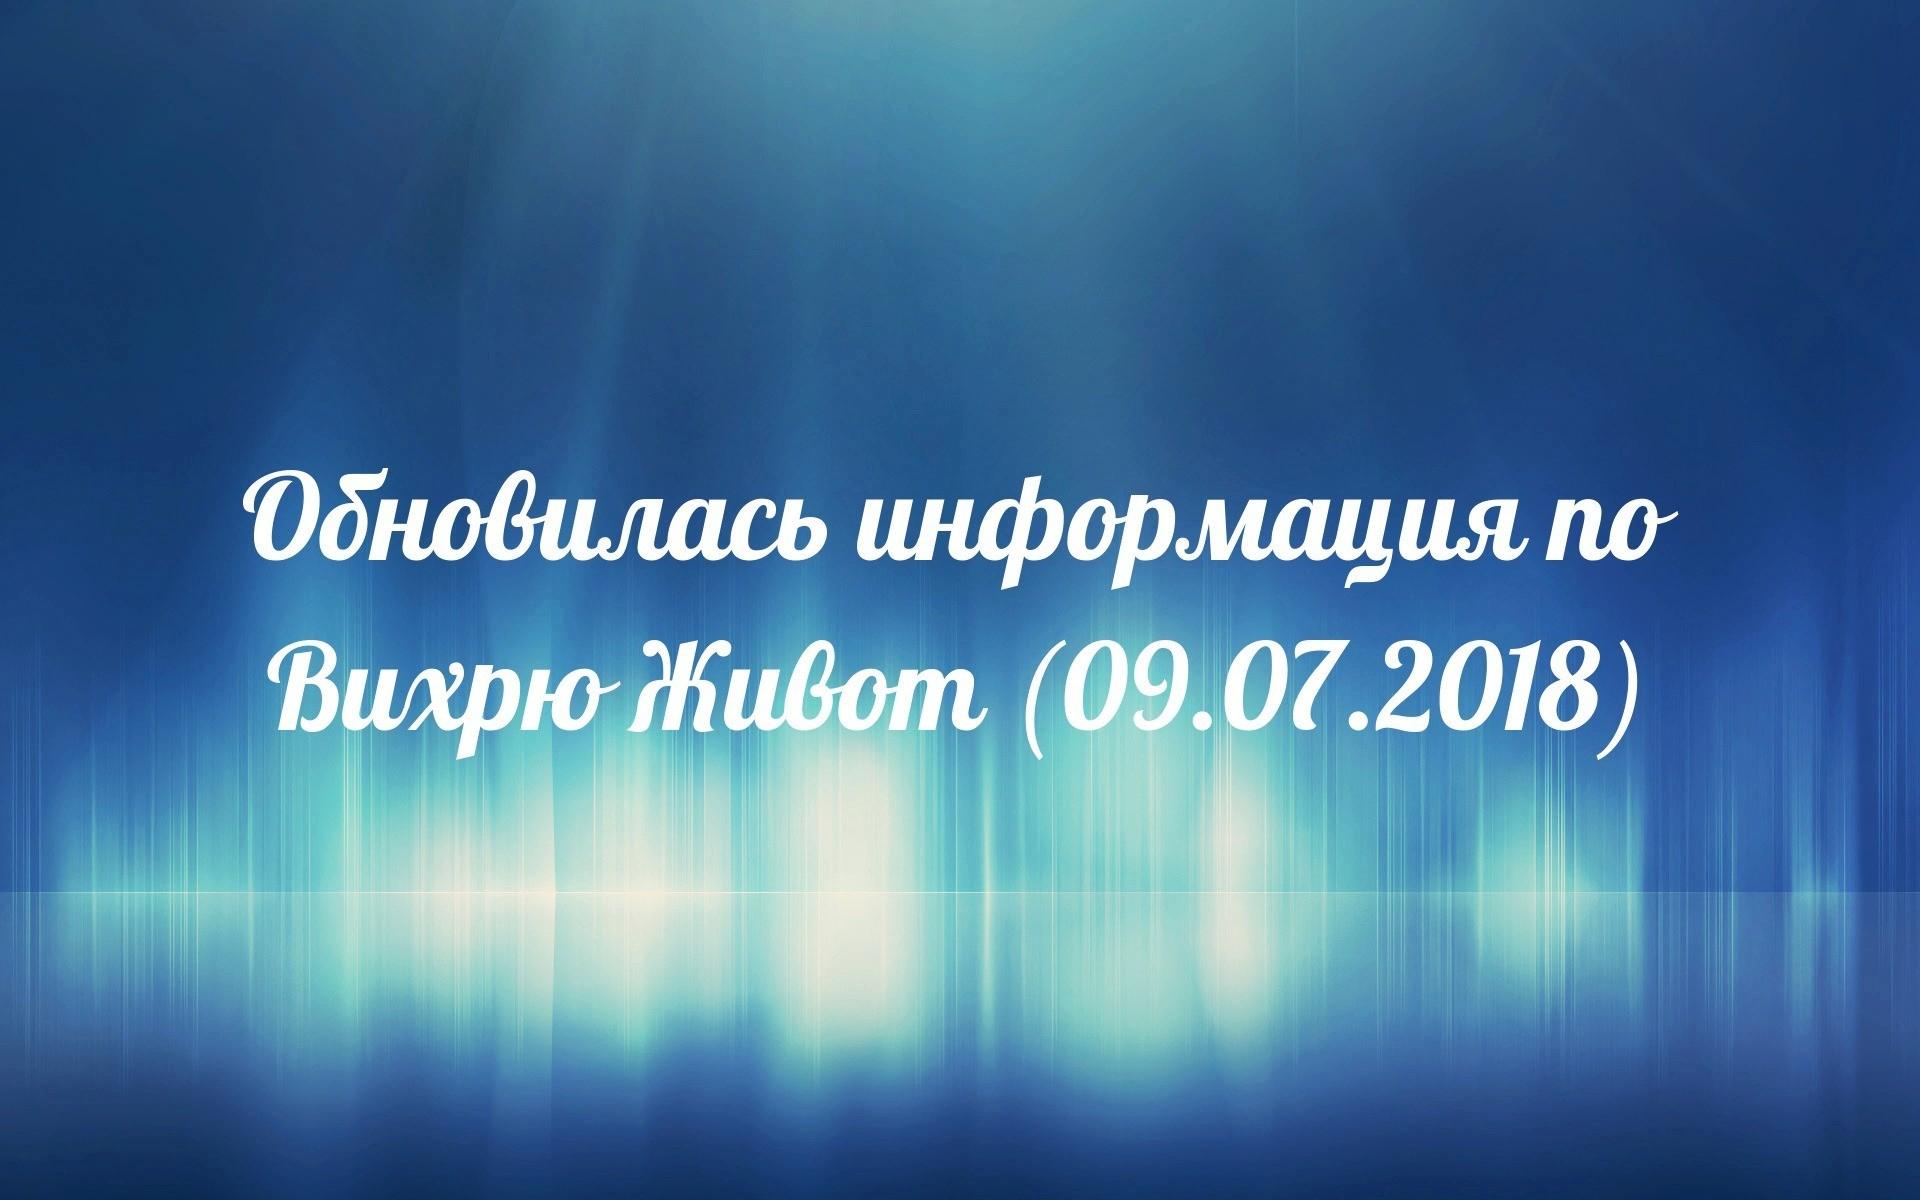 Обновилась информация по Вихрю Живот (09.07.2018)